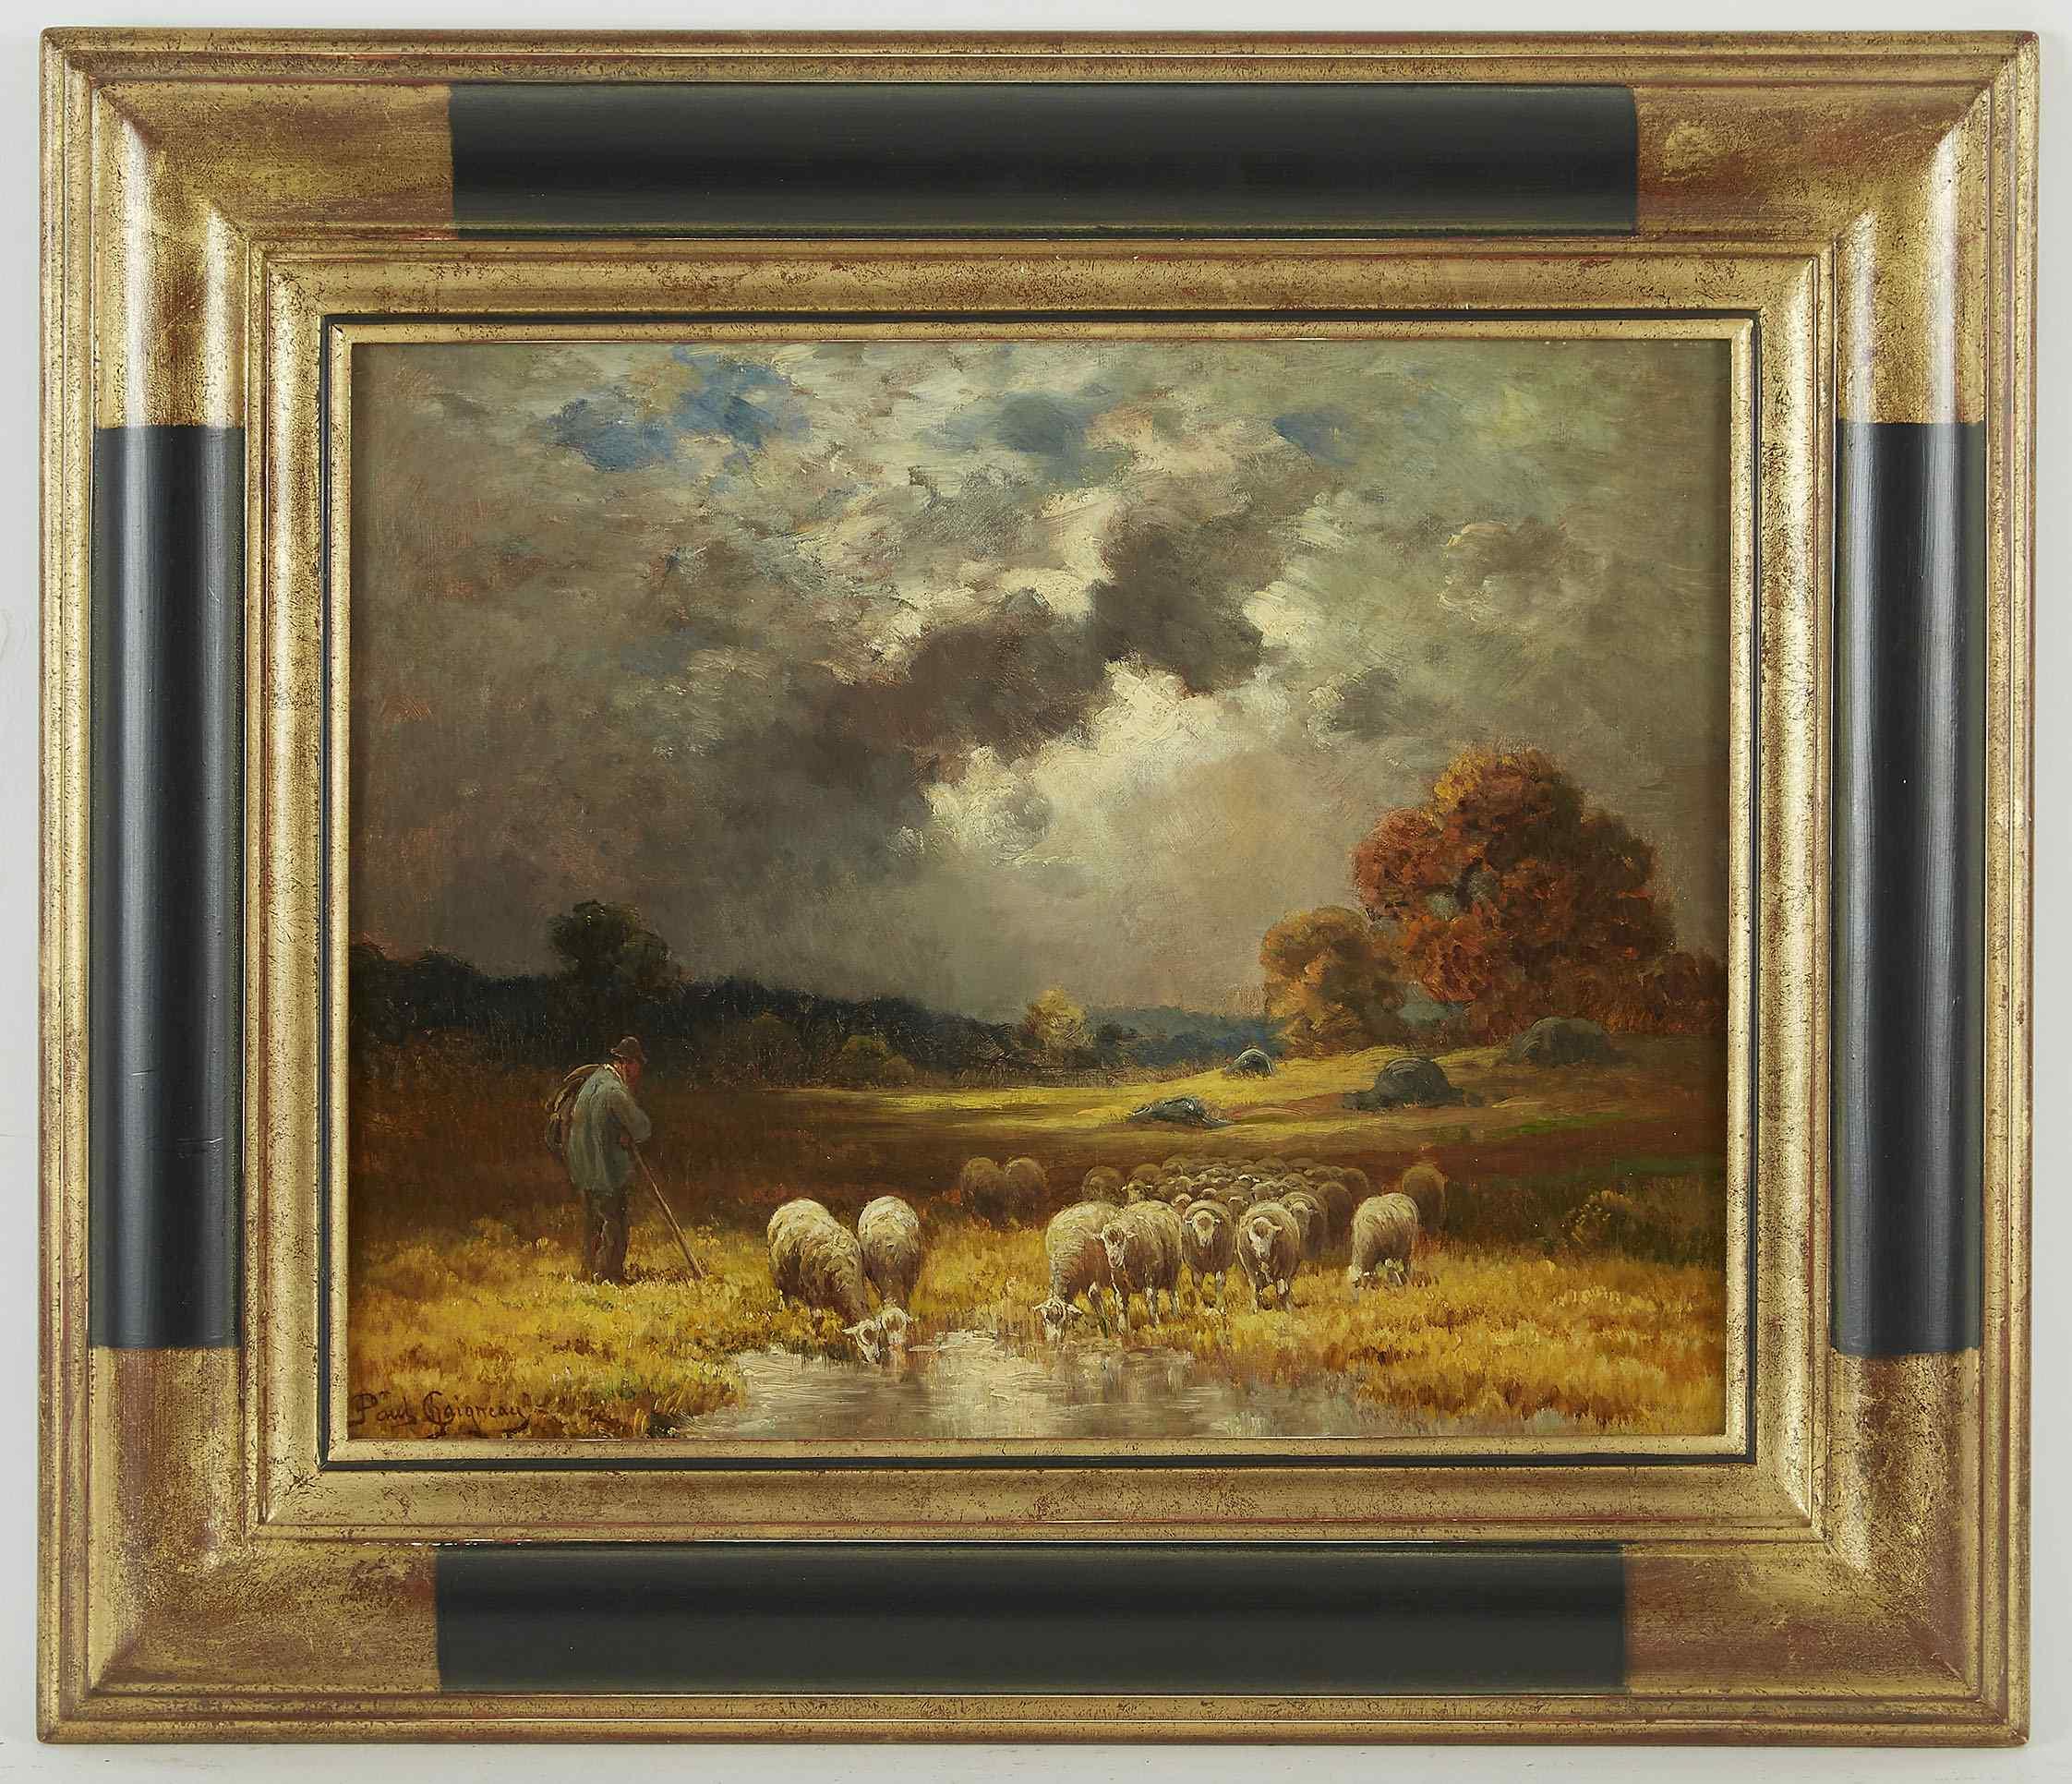 Paul Chaigneau, Shepherd And Flock, School Of Barbizon.